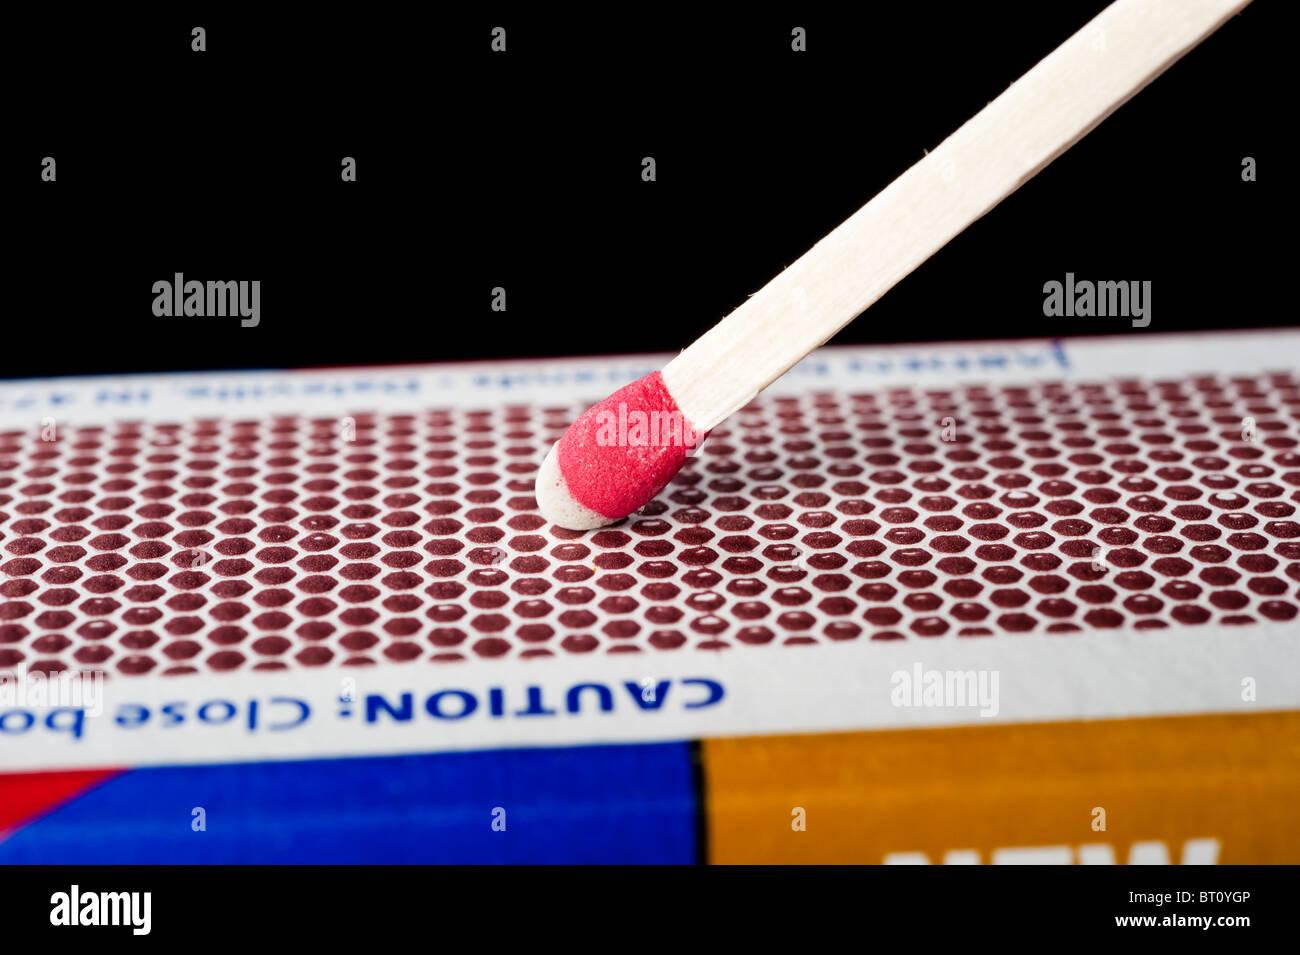 A wooden match stick on a matchbox striking surface. - Stock Image